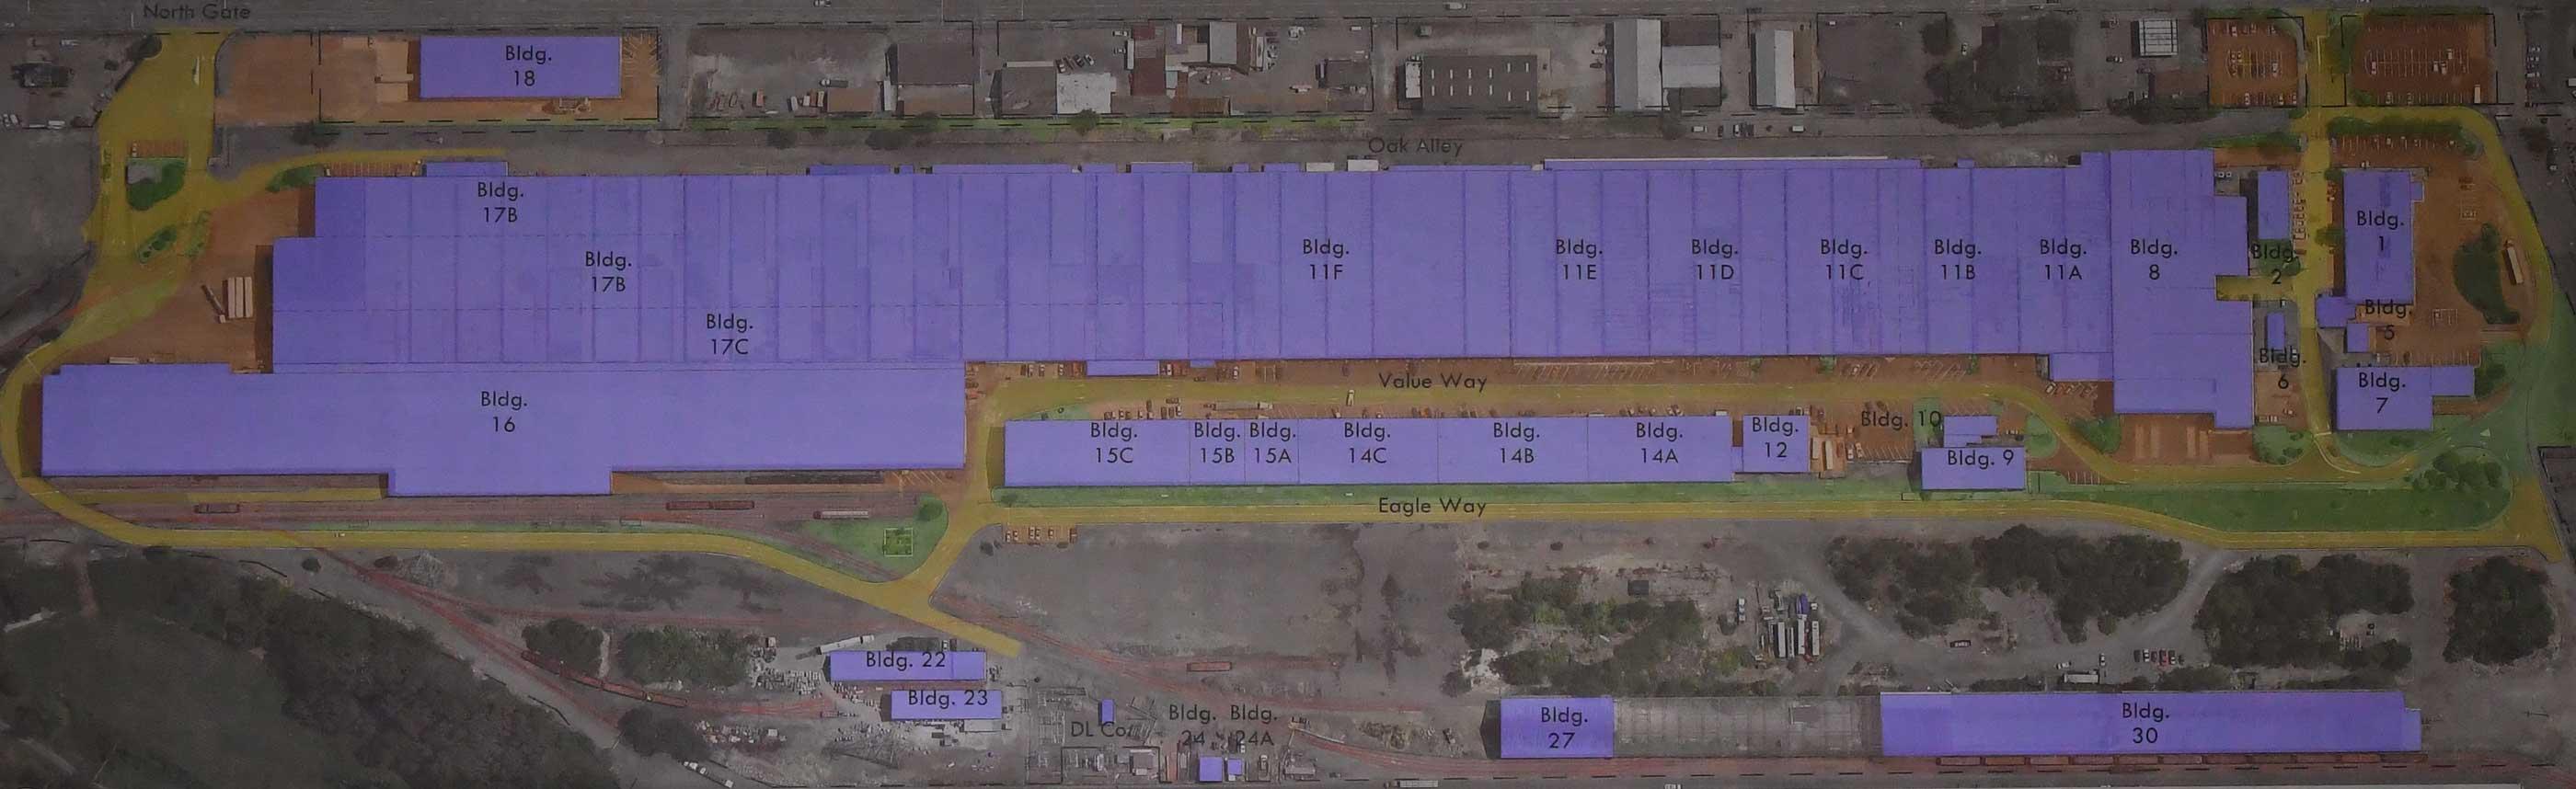 Ambridge Regional Arial View Plan